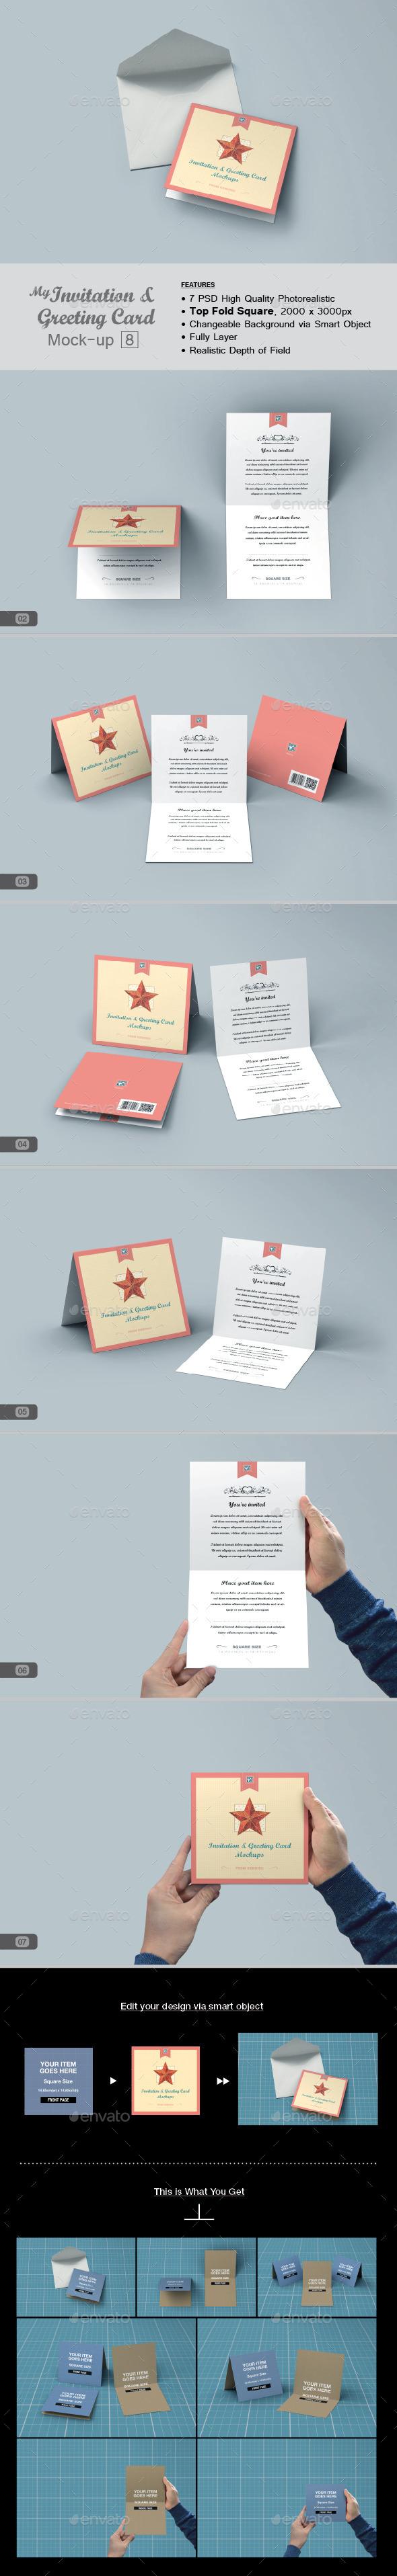 GraphicRiver myGreeting Card Mock-up v8 11587173